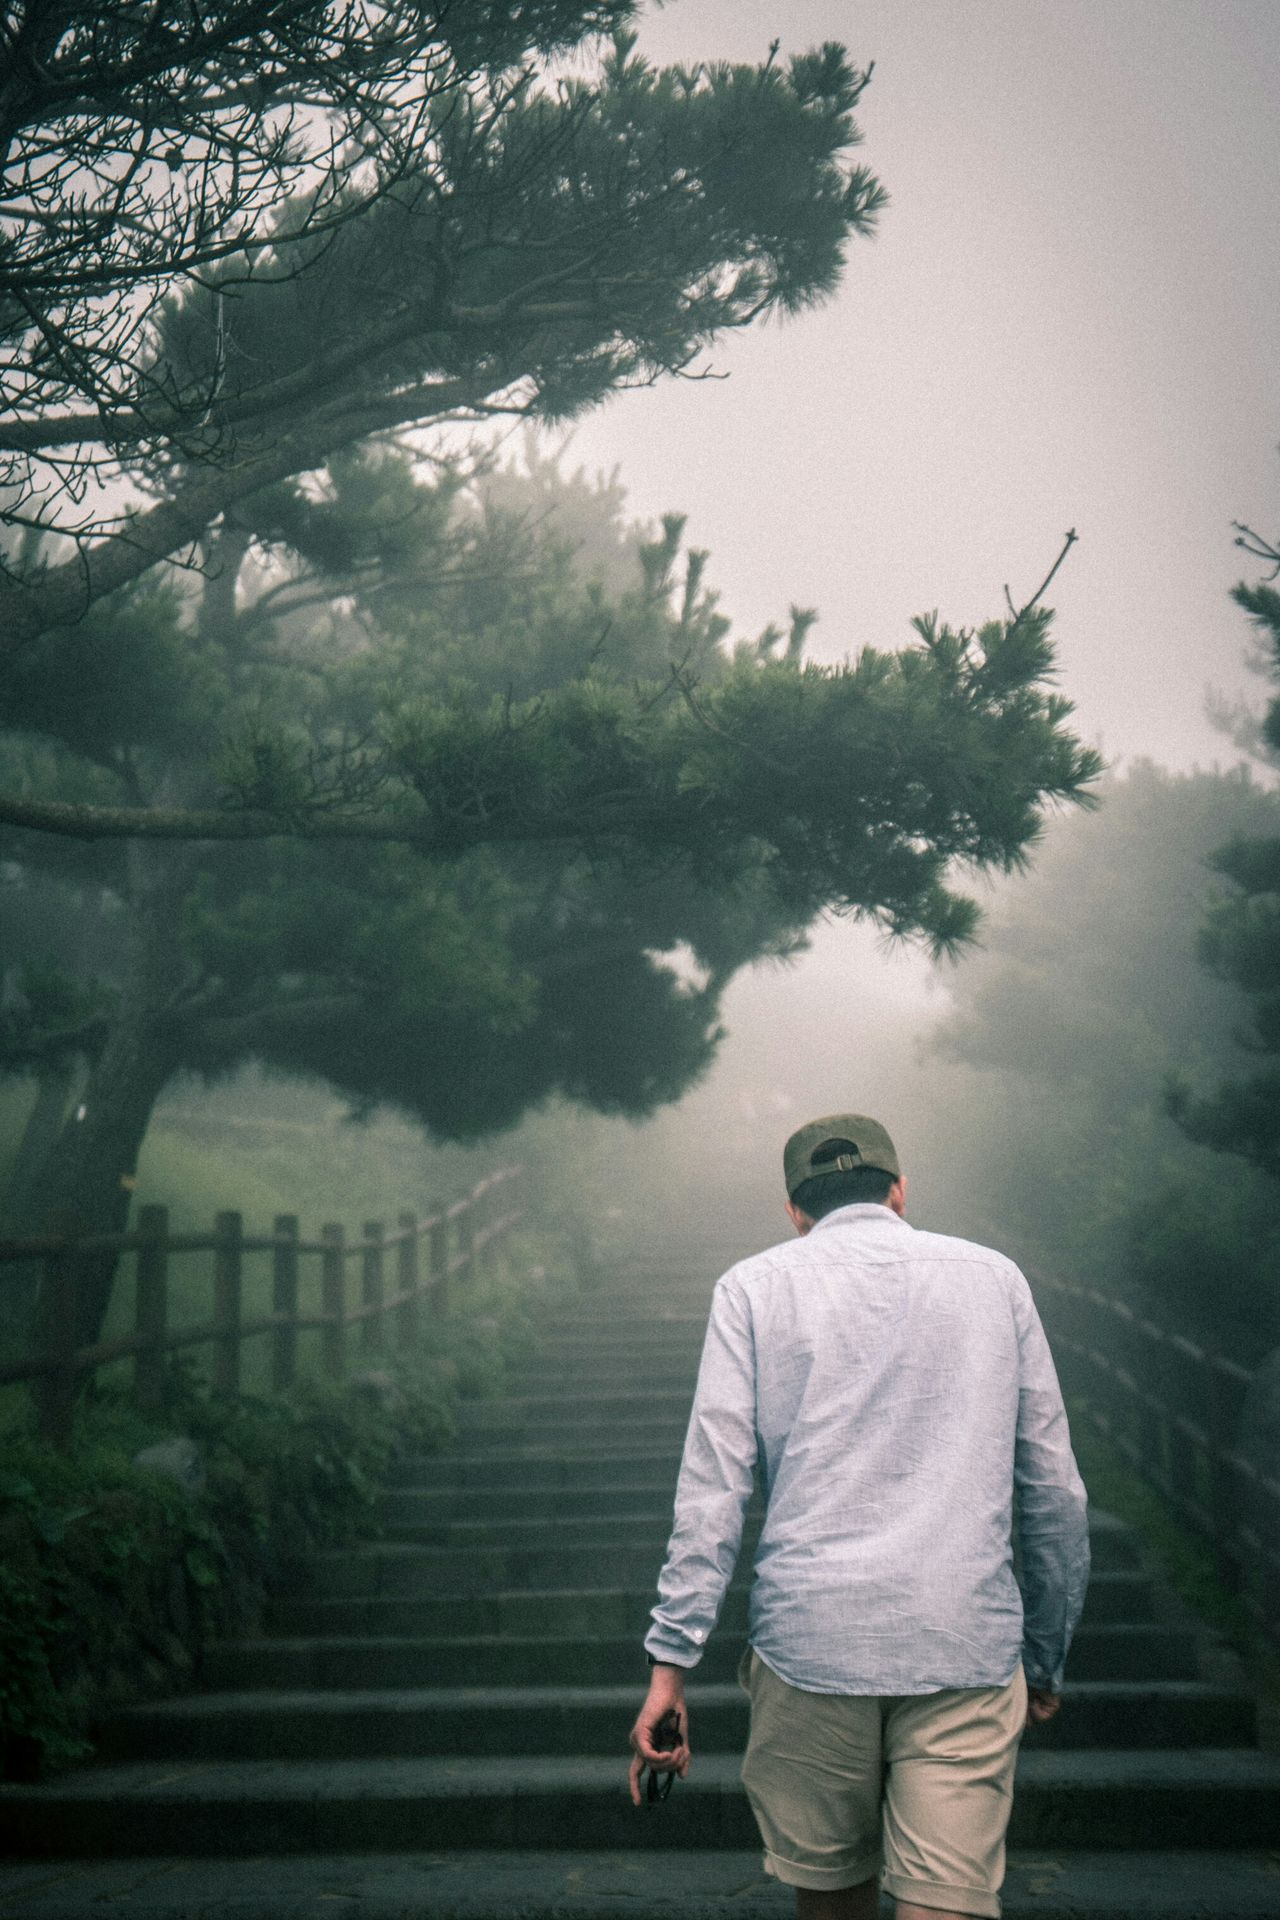 JEJU ISLAND  Foggy Day Mist EyeEm Nature Lover People Scenery Peoplephotography Eye4photography  EyeEm Best Shots EyeEm Korea